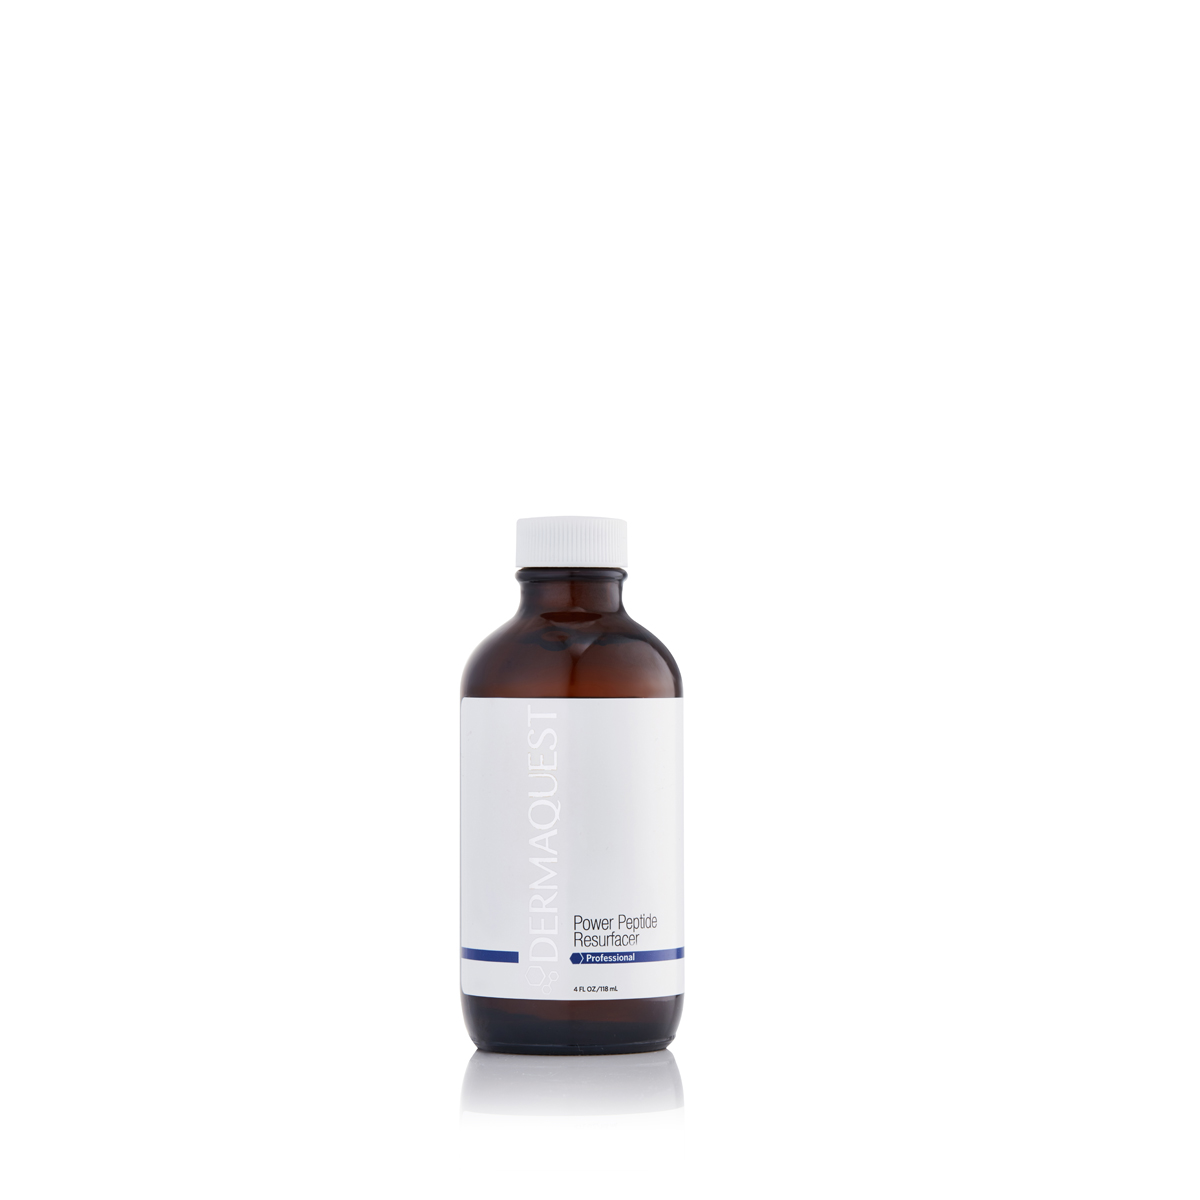 Power Peptide Resurfacer – Professional